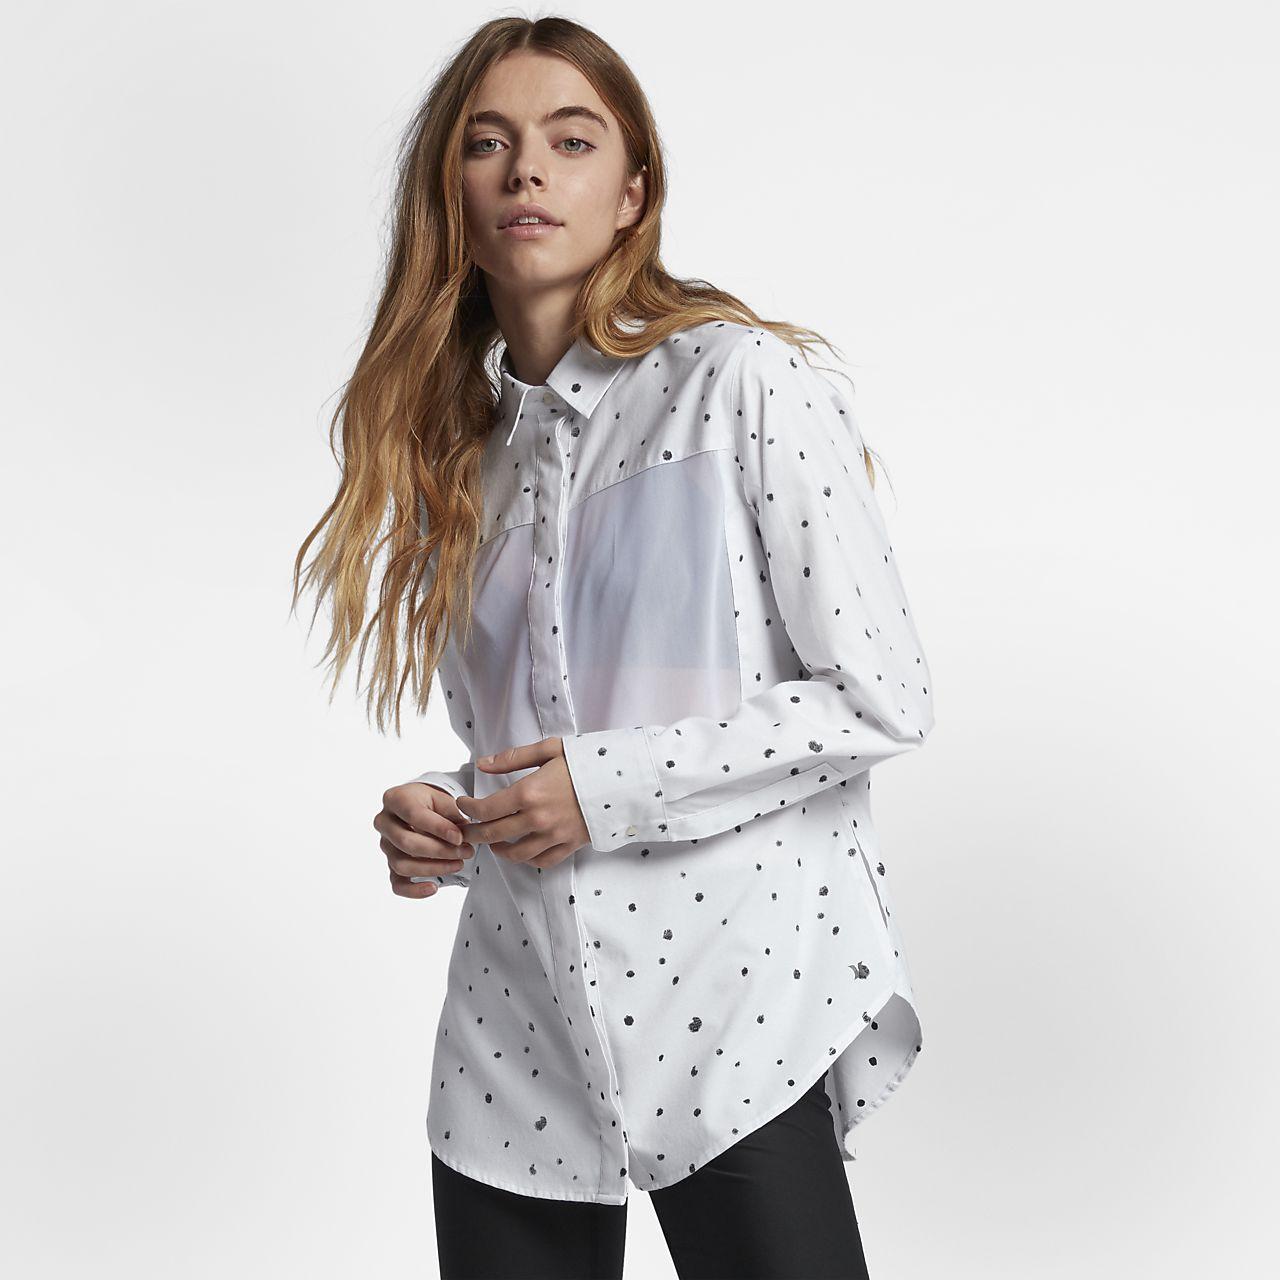 Hurley Wilson Women's Long Sleeve Shirts White